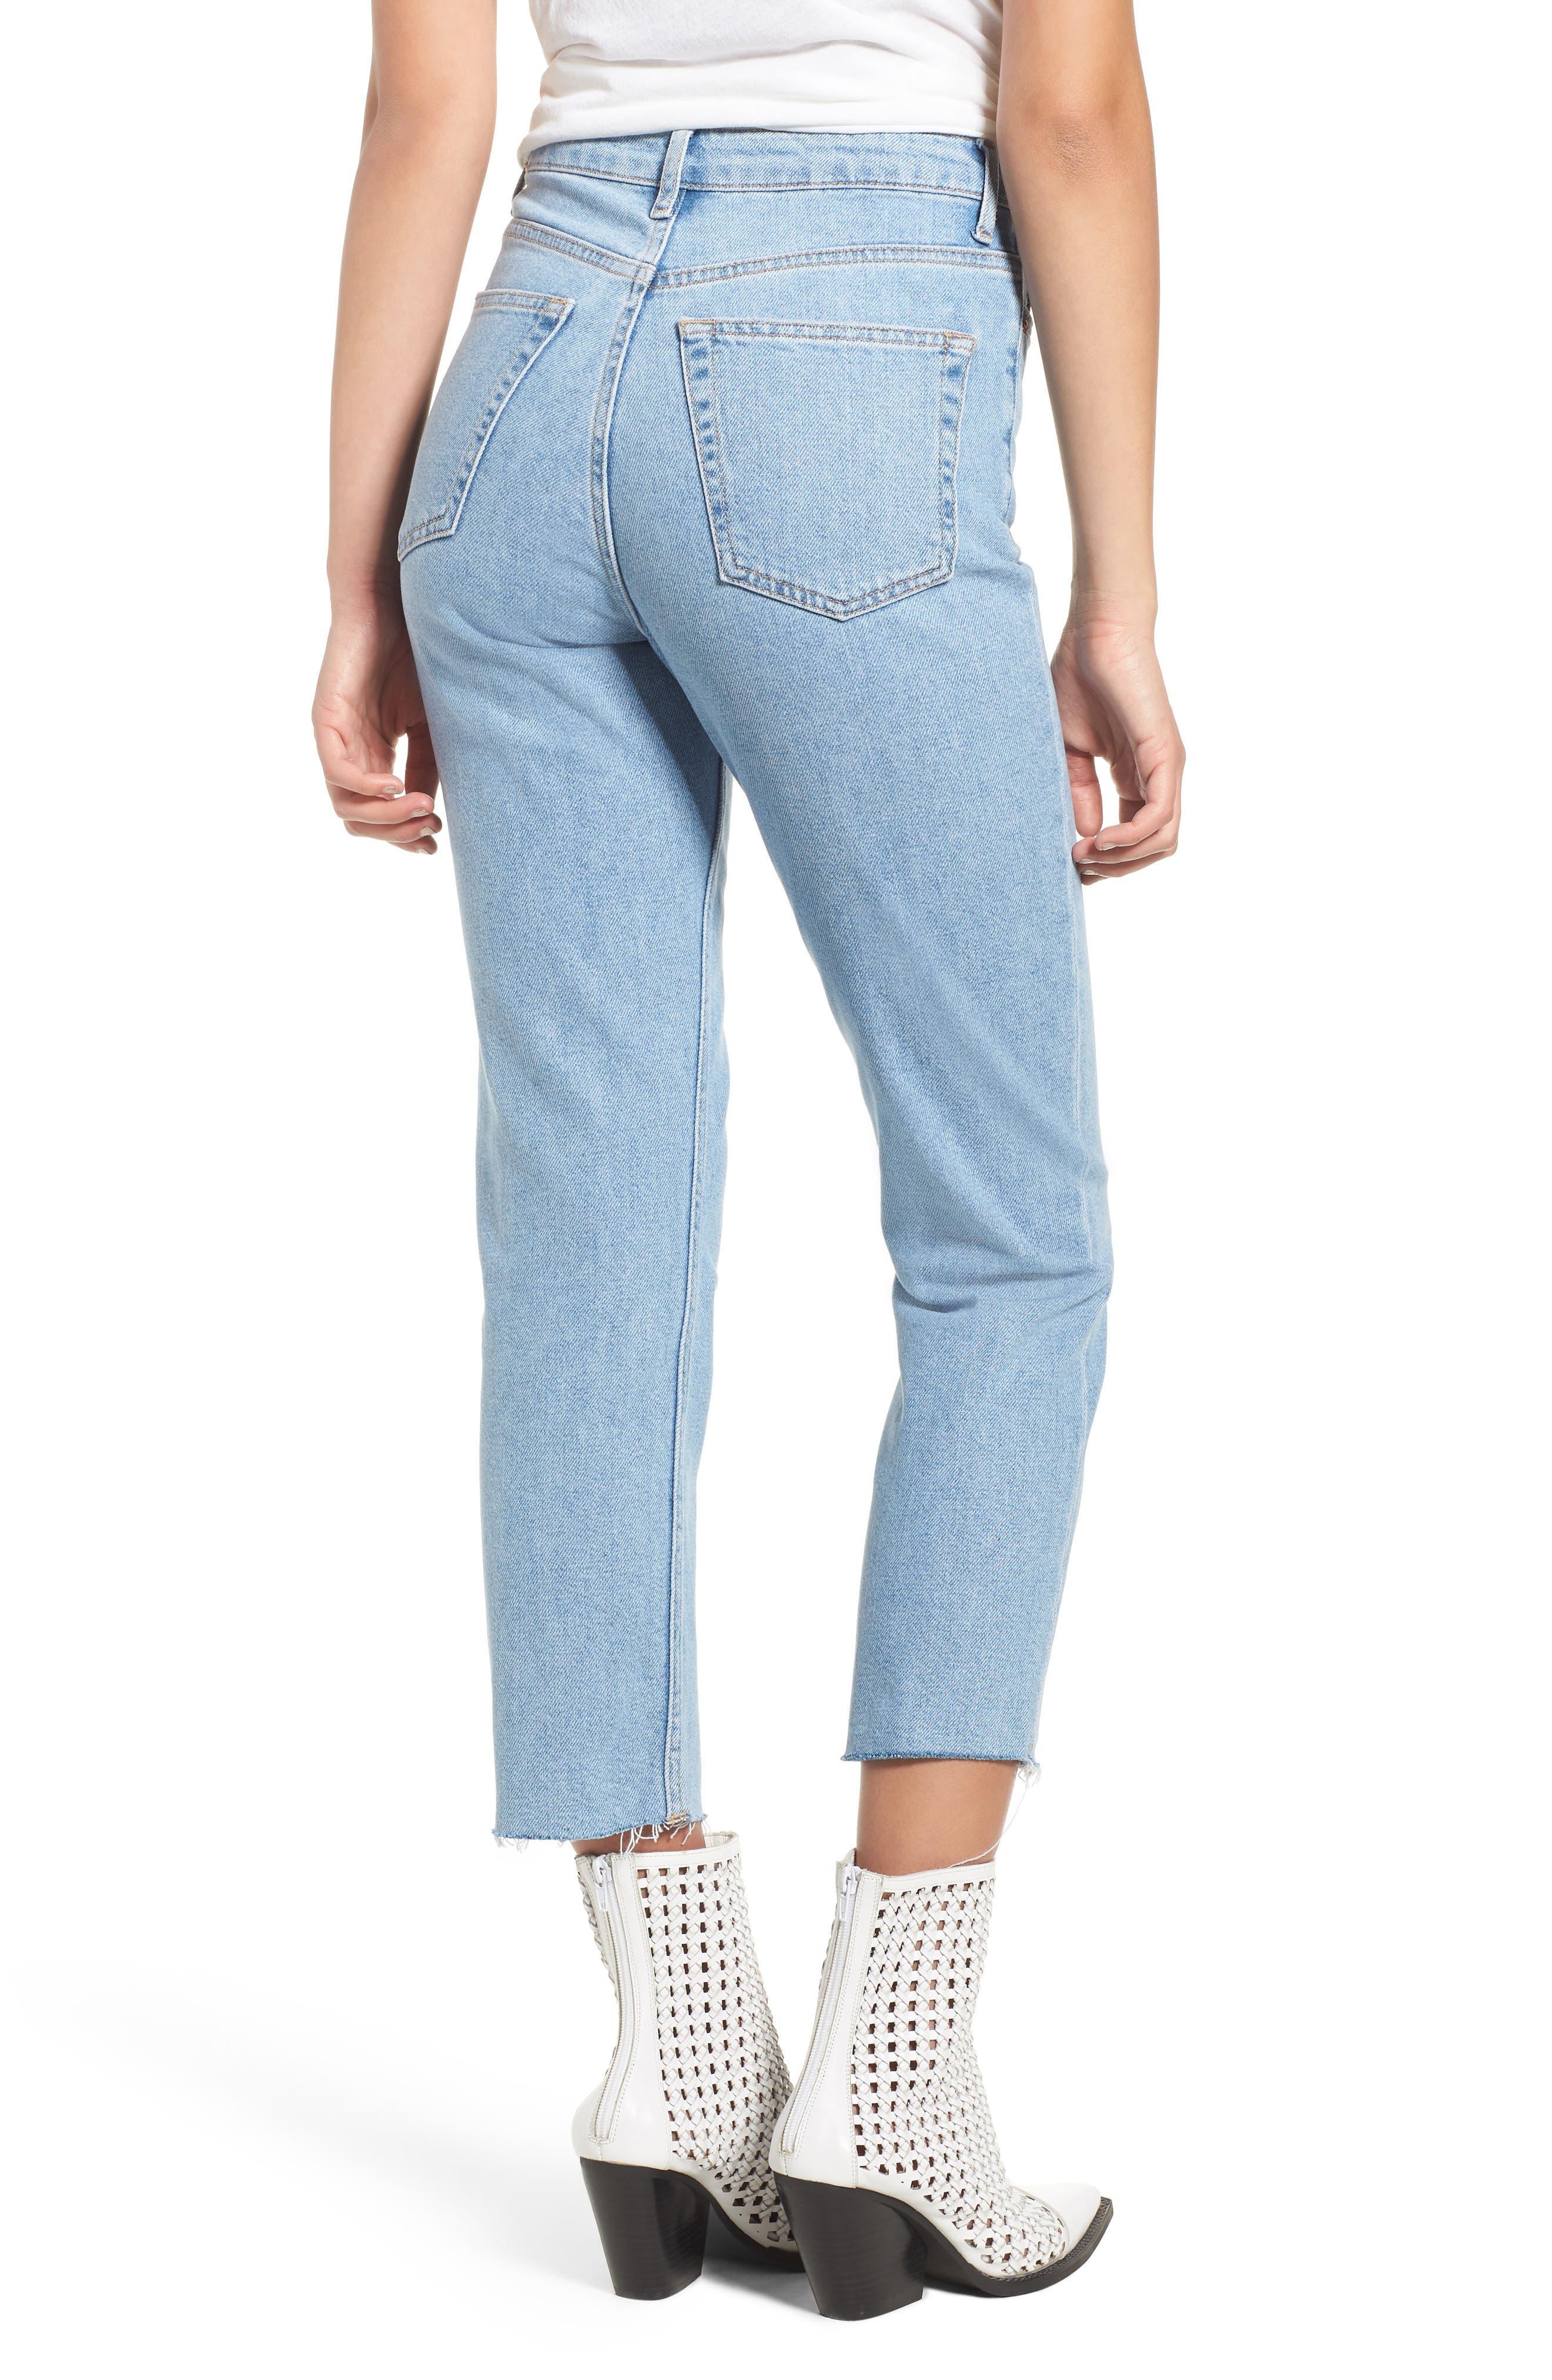 TOPSHOP, Raw Hem Straight Leg Jeans, Alternate thumbnail 2, color, BLEACH STONE DENIM